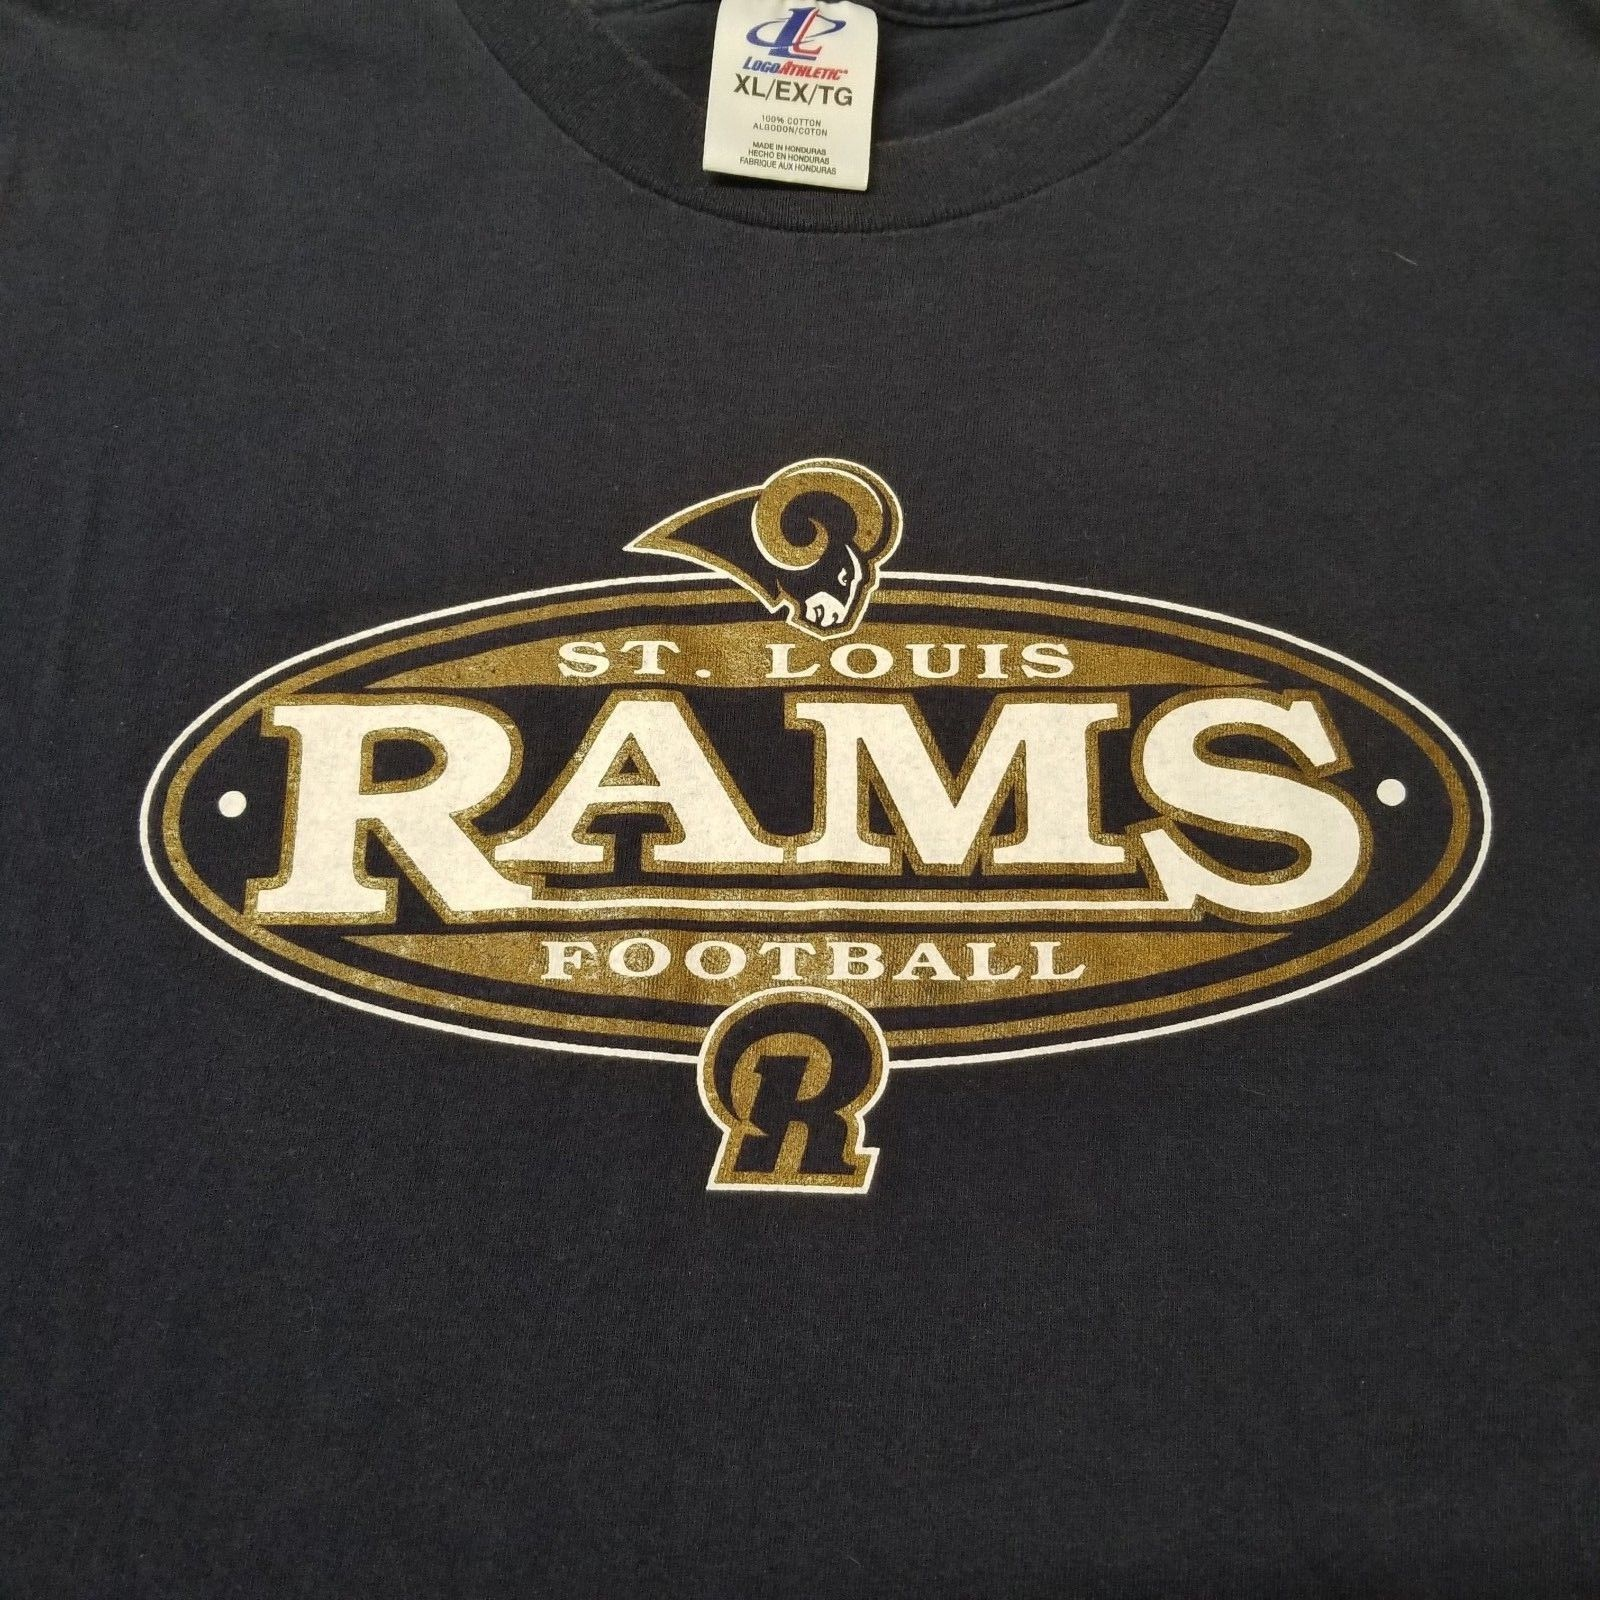 St. Louis Rams NFL Football Mens Size XL Blue Short Sleeve T Shirt image 7